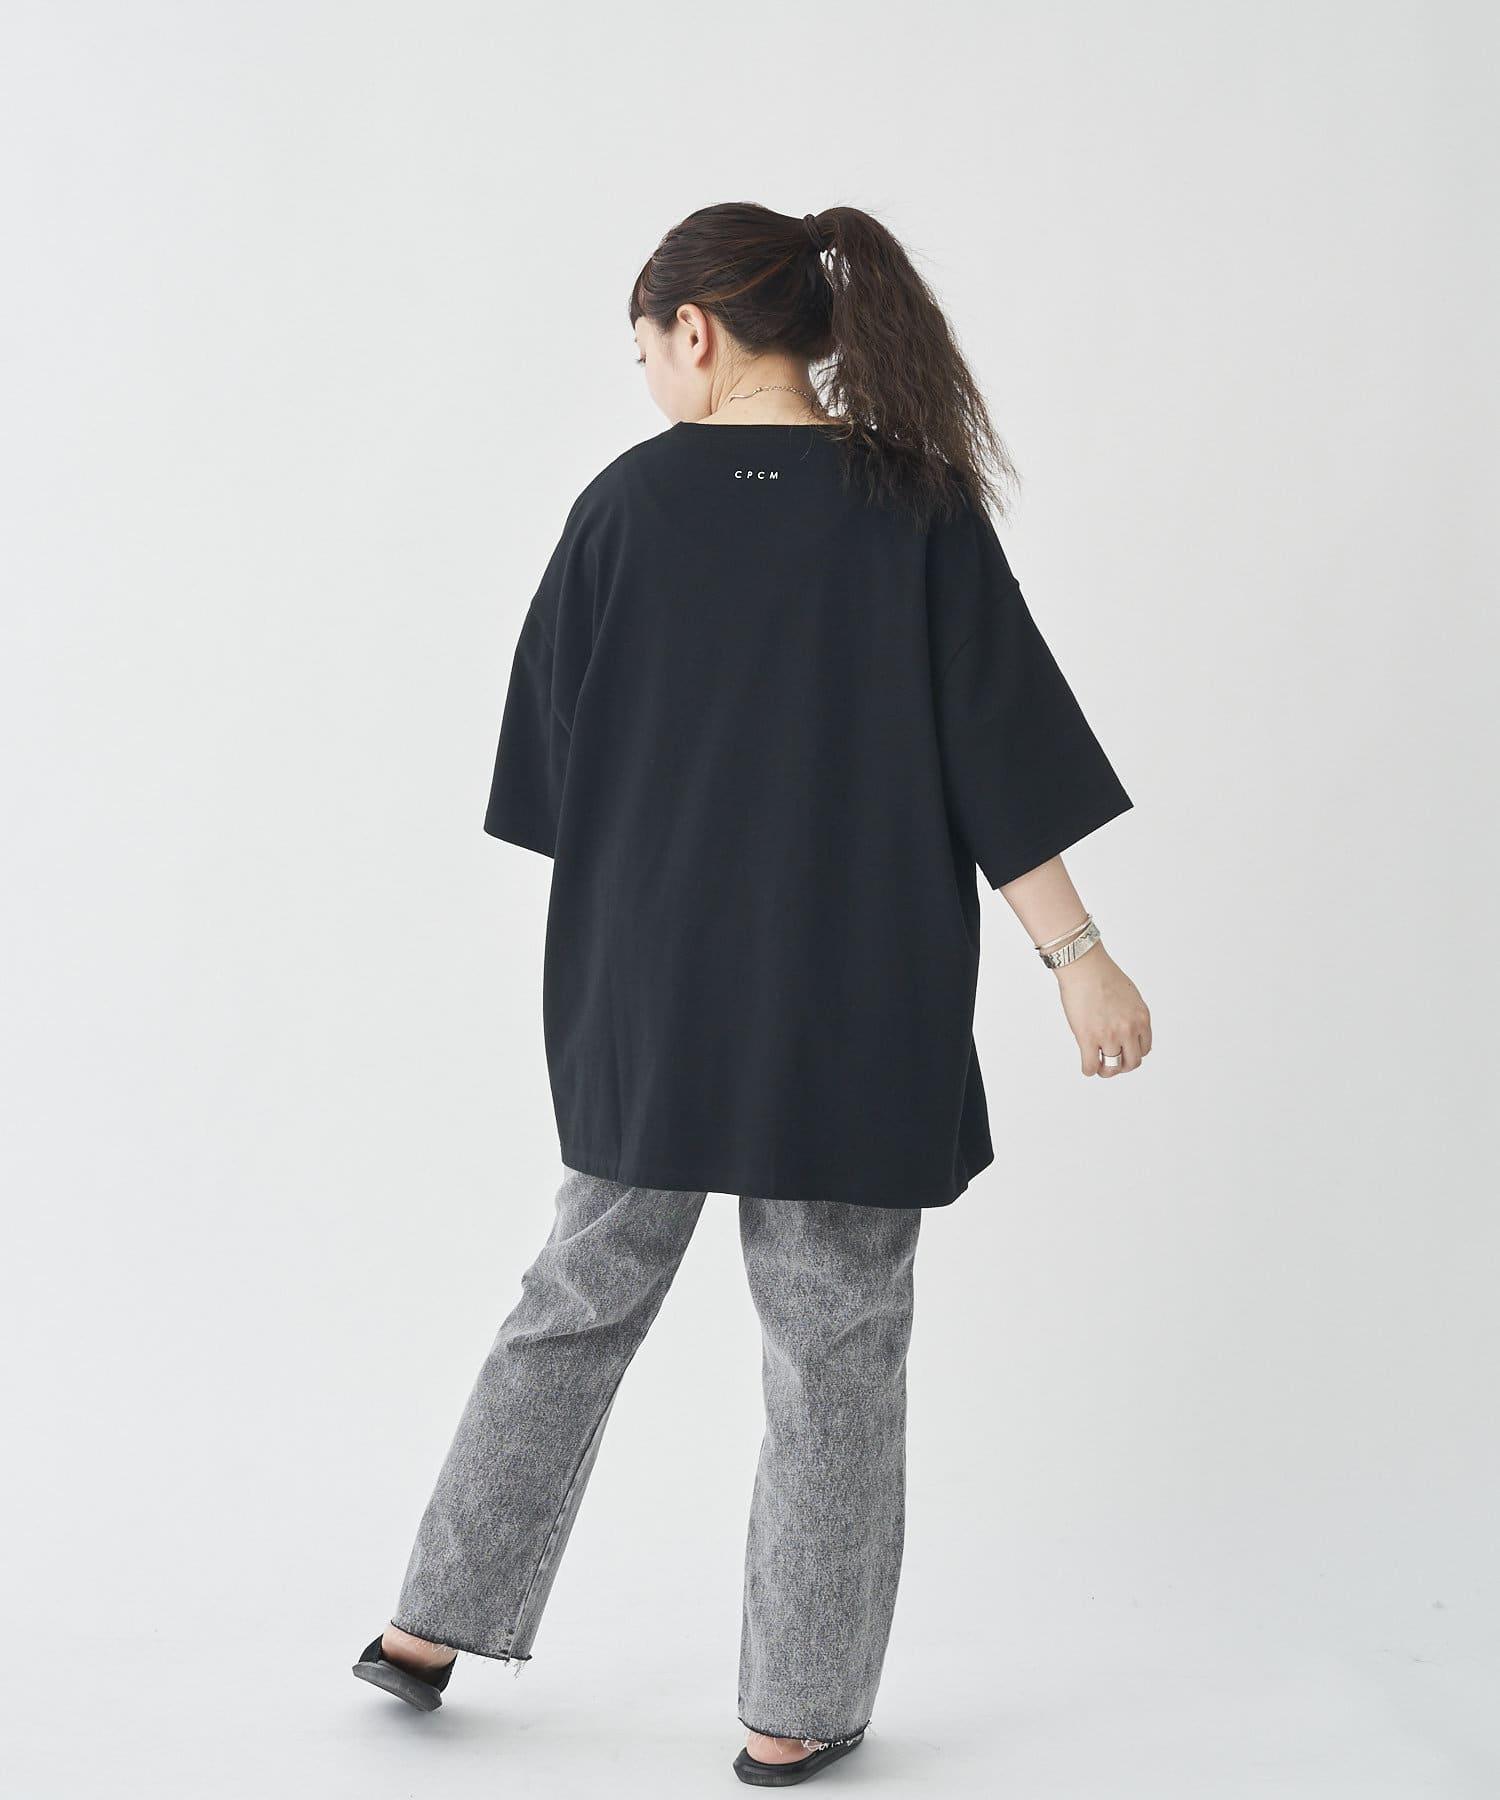 CPCM(シーピーシーエム) 【SEIJI MATSUMOTO×CPCM】ワンポイント刺繍BIGT